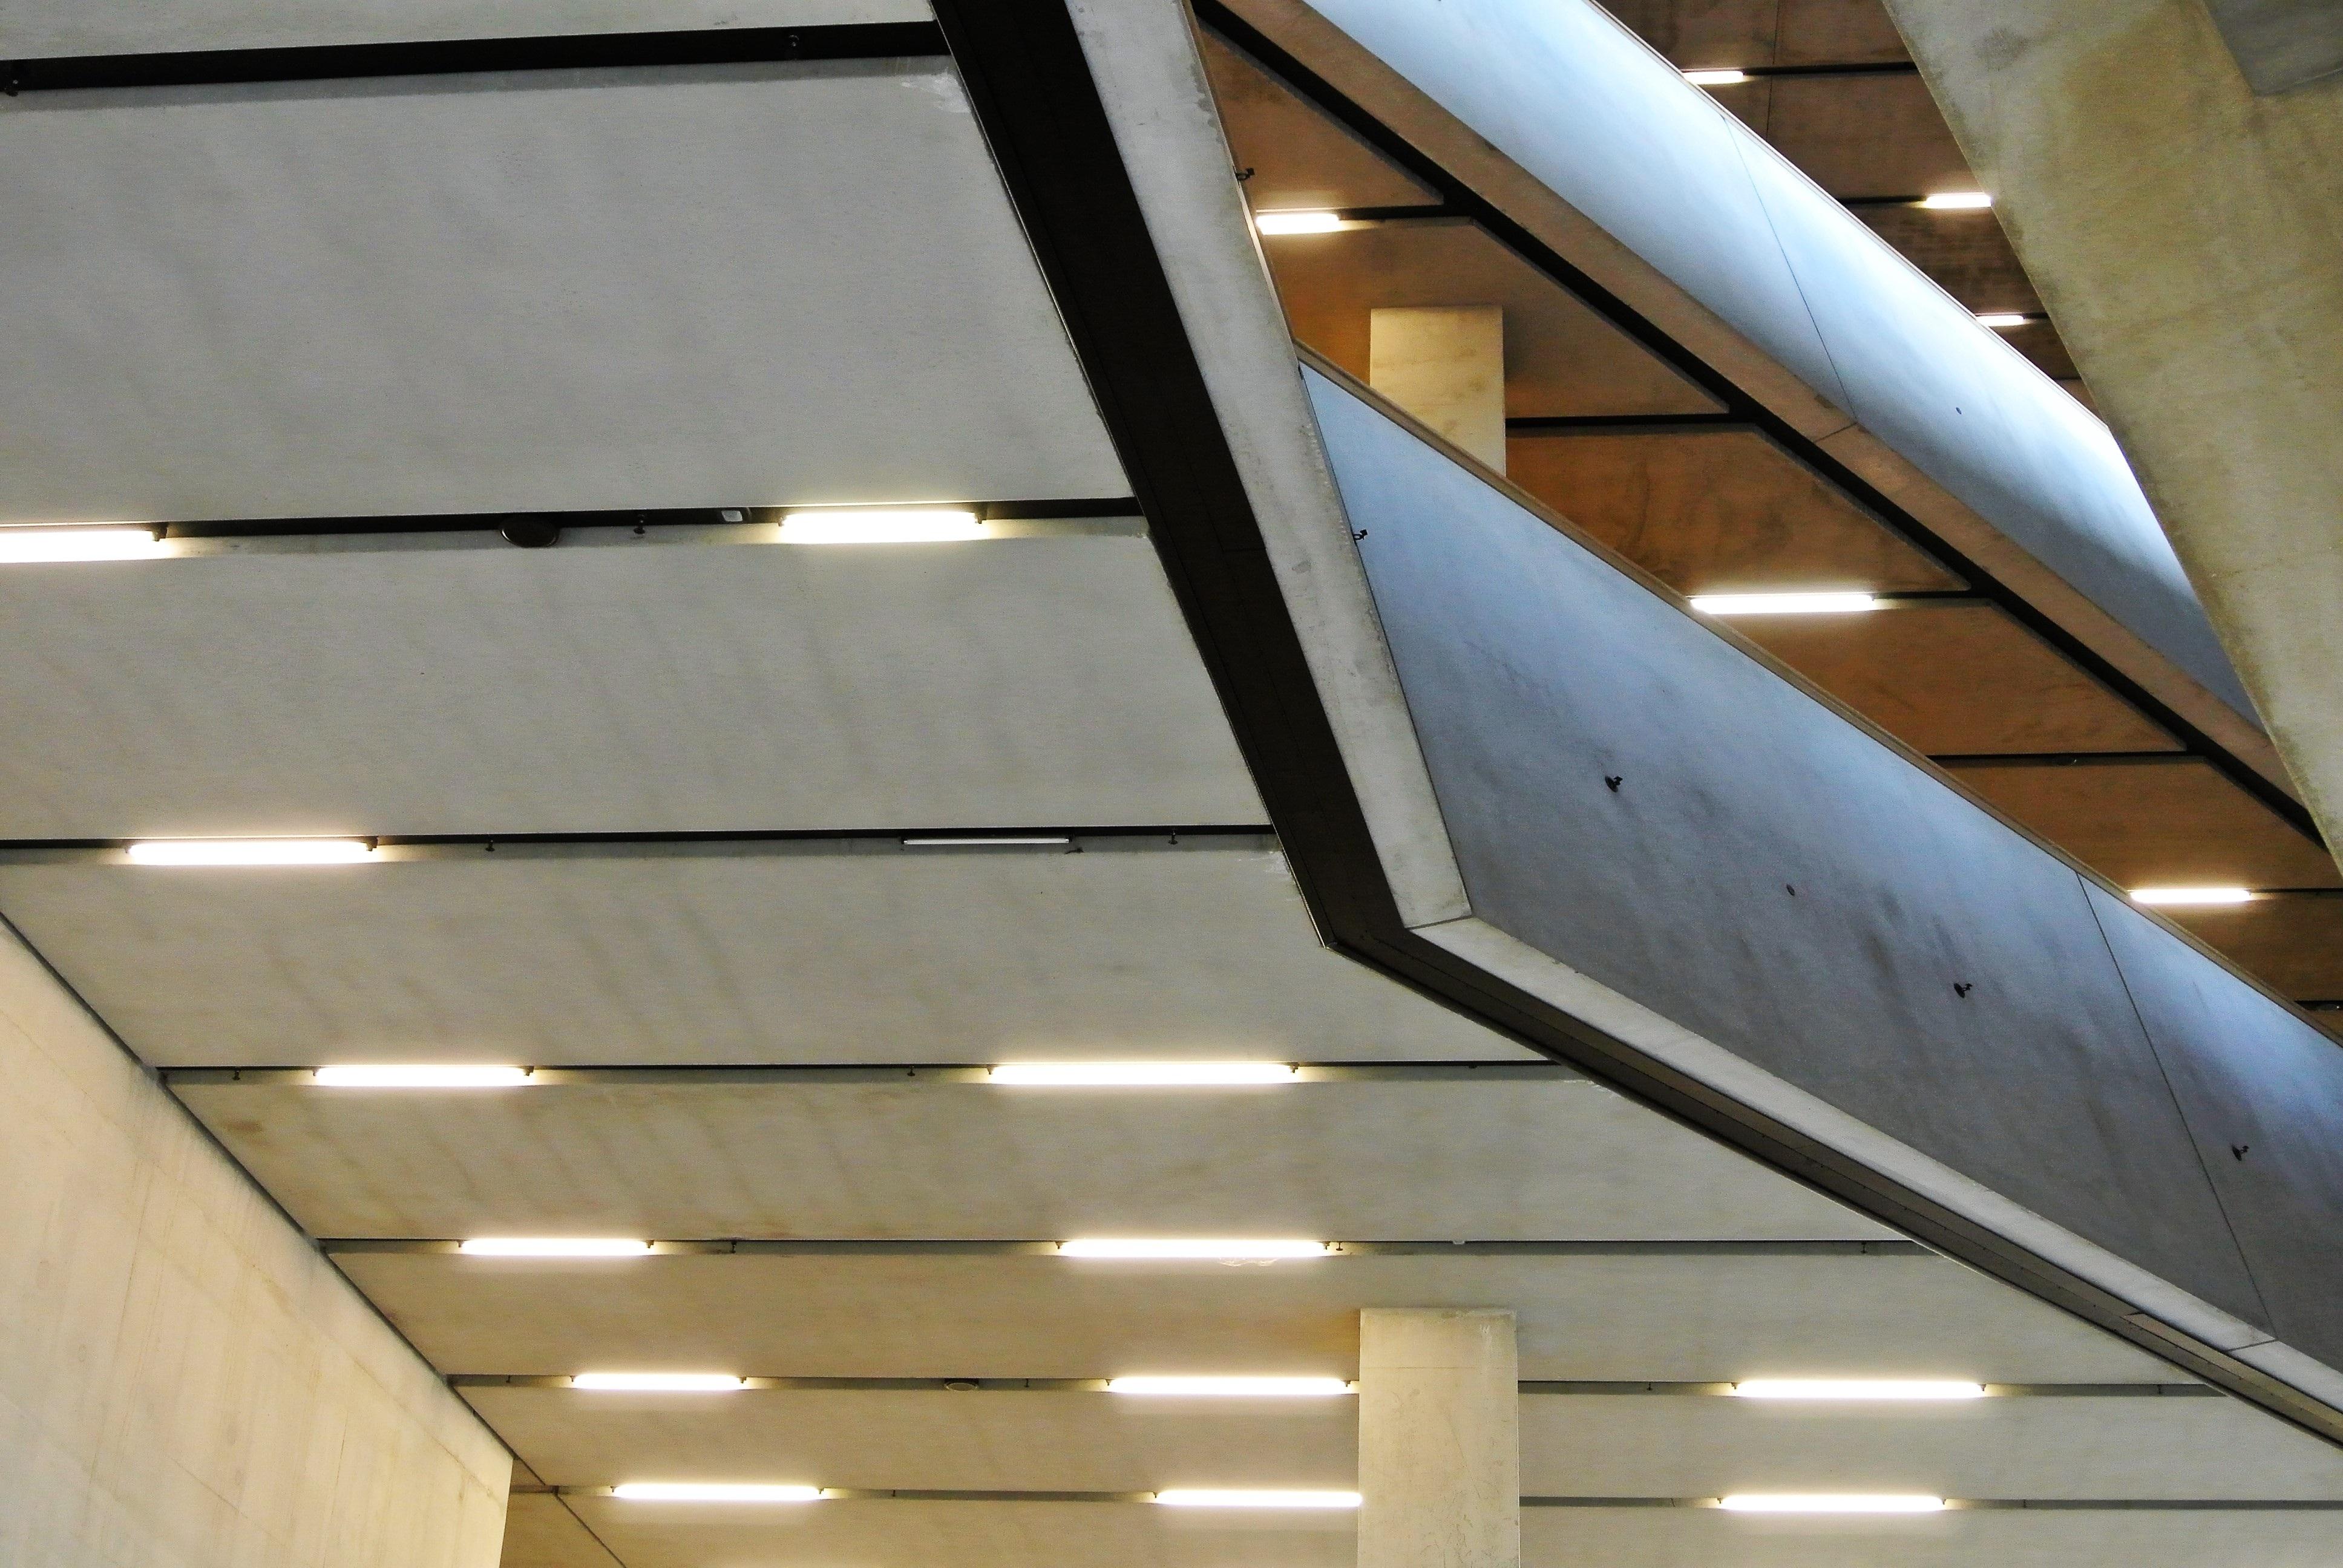 Free Images Light Architecture Roof Beam Ceiling Facade Lighting Modern Concrete Plain Interior Design Handrail Brutal Daylighting Baluster Window Covering Sleek 3872x2592 1170518 Free Stock Photos Pxhere